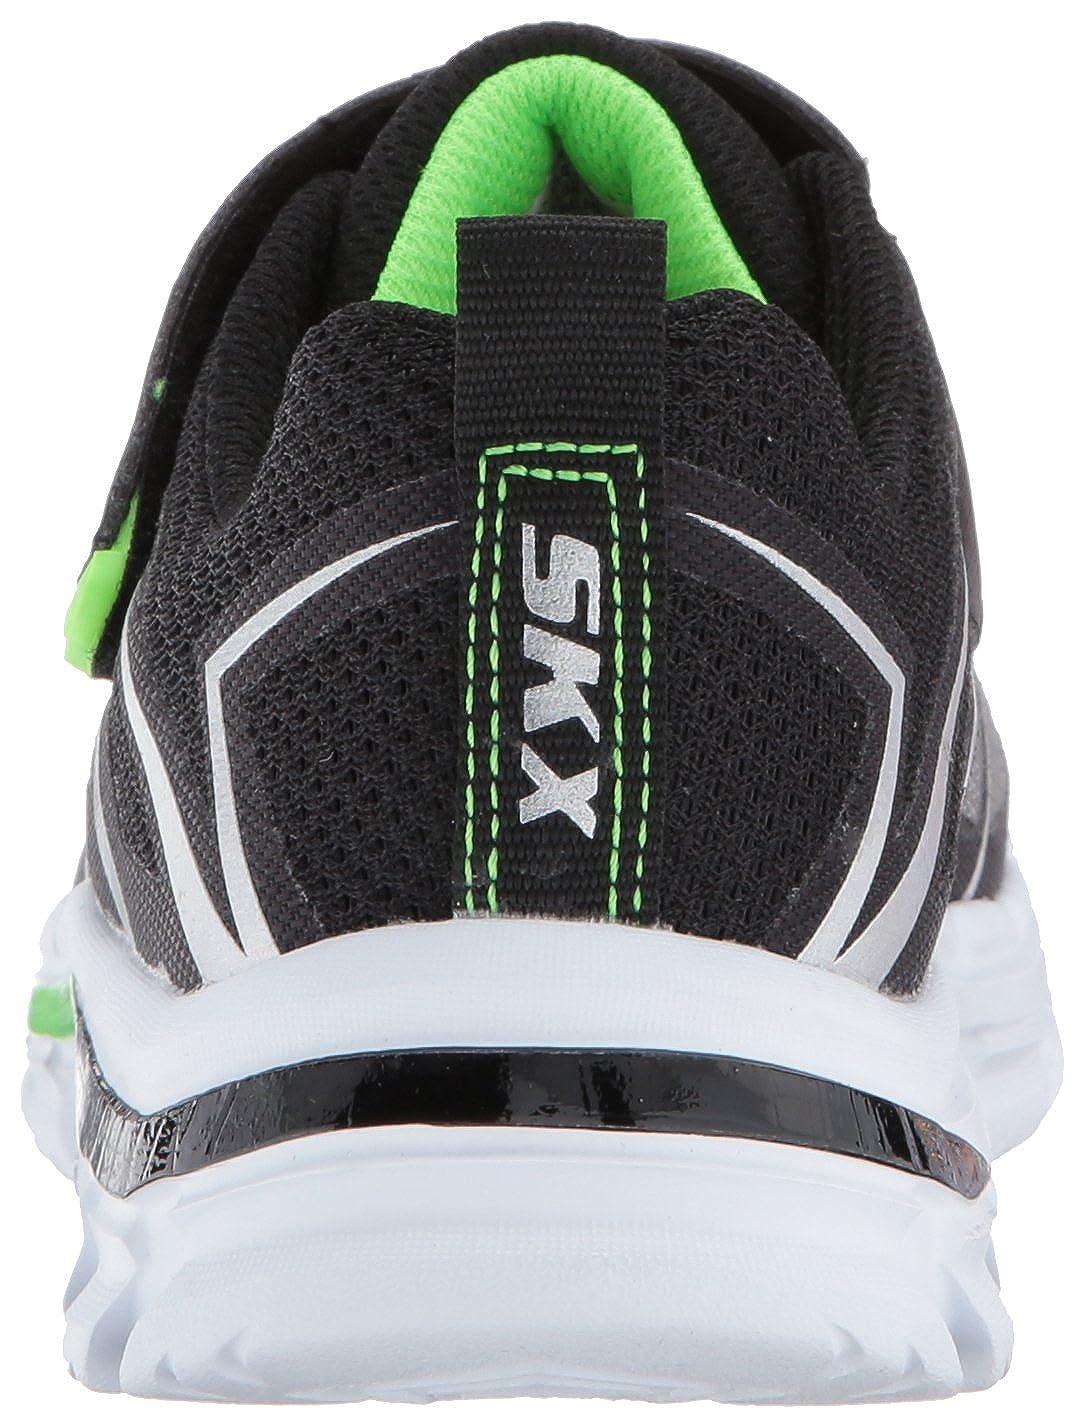 Skechers Kids Boys' Nitrate 95359L Sneaker, RoyalBlack, 11.5 M US Little Kid